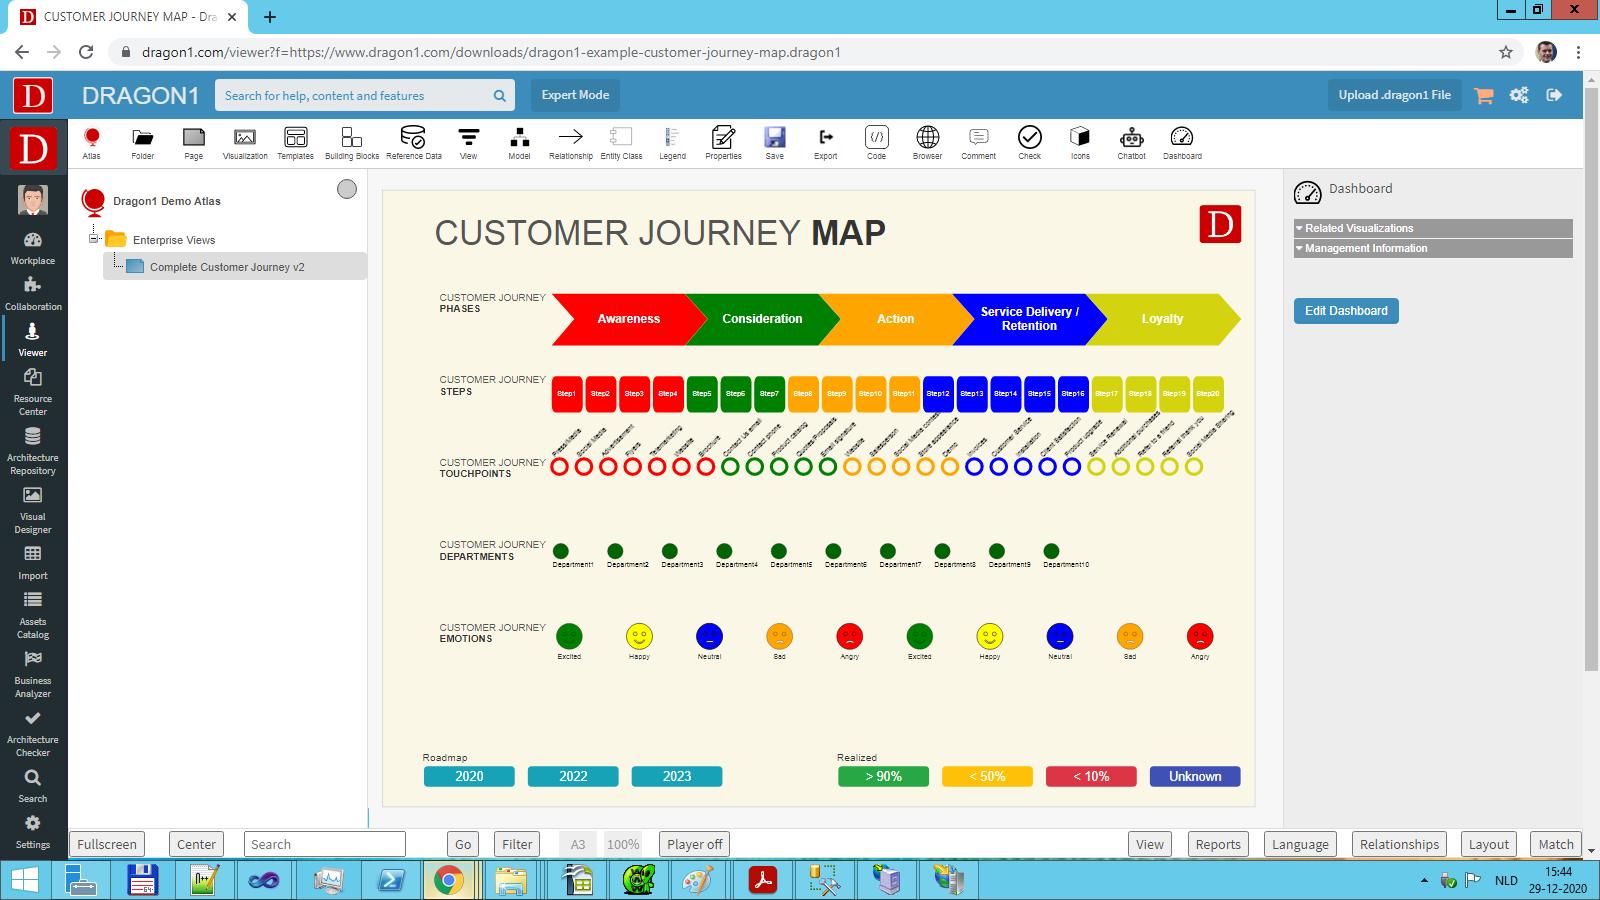 dragon1 customer journey map